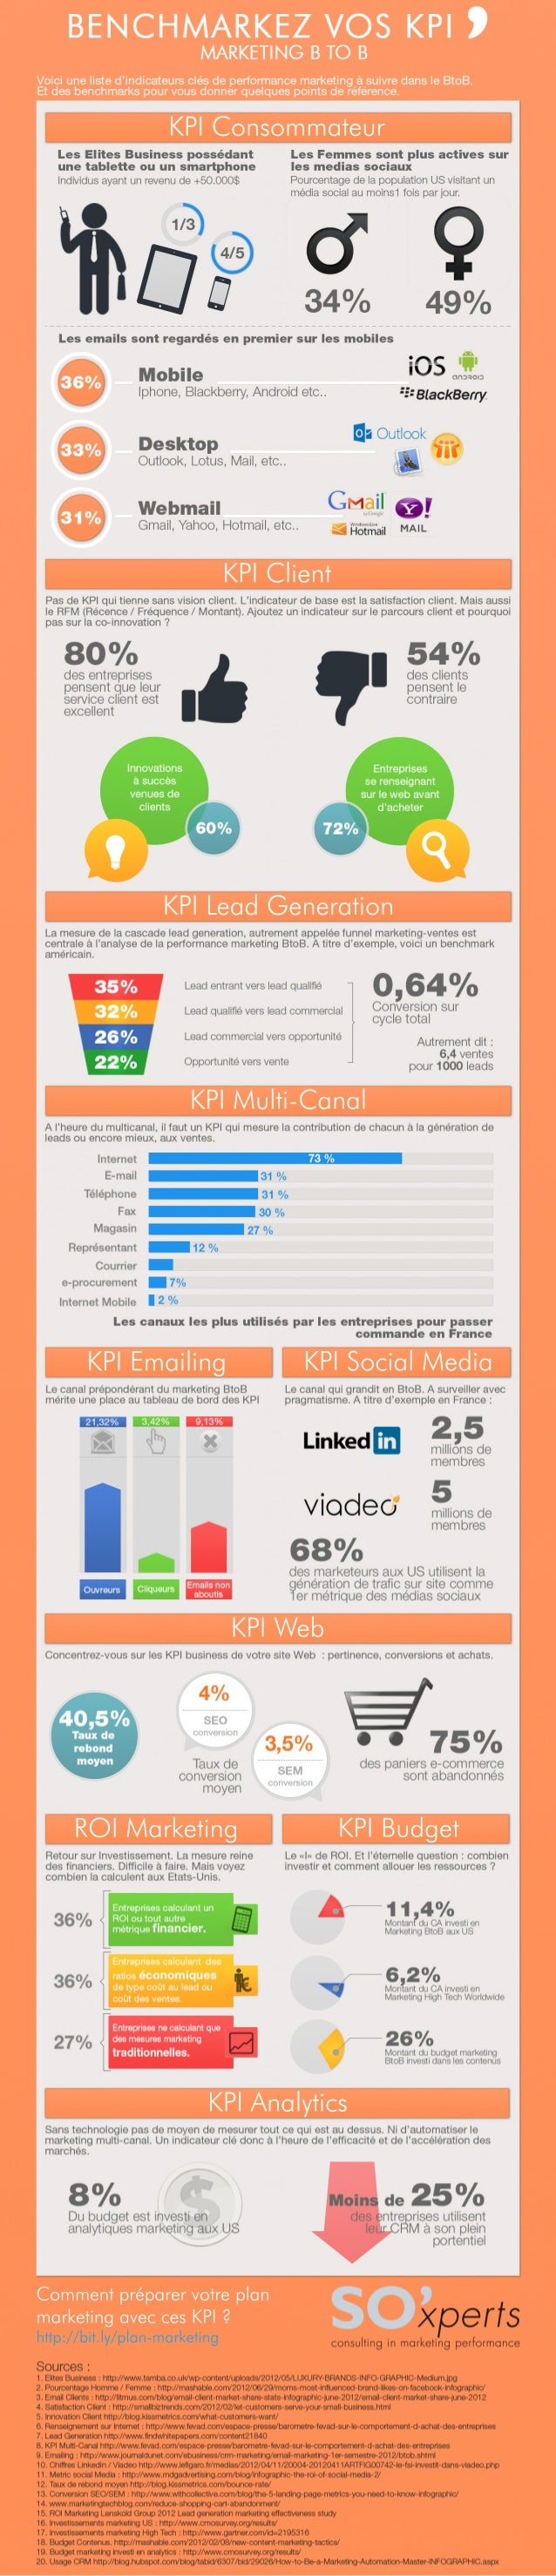 Commentpréparervotreplan marketingaveccesKPI? http://bit.ly/plan-marketing KPIAnalytics KPIBudgetROIMarketing KPIWeb KPISo...